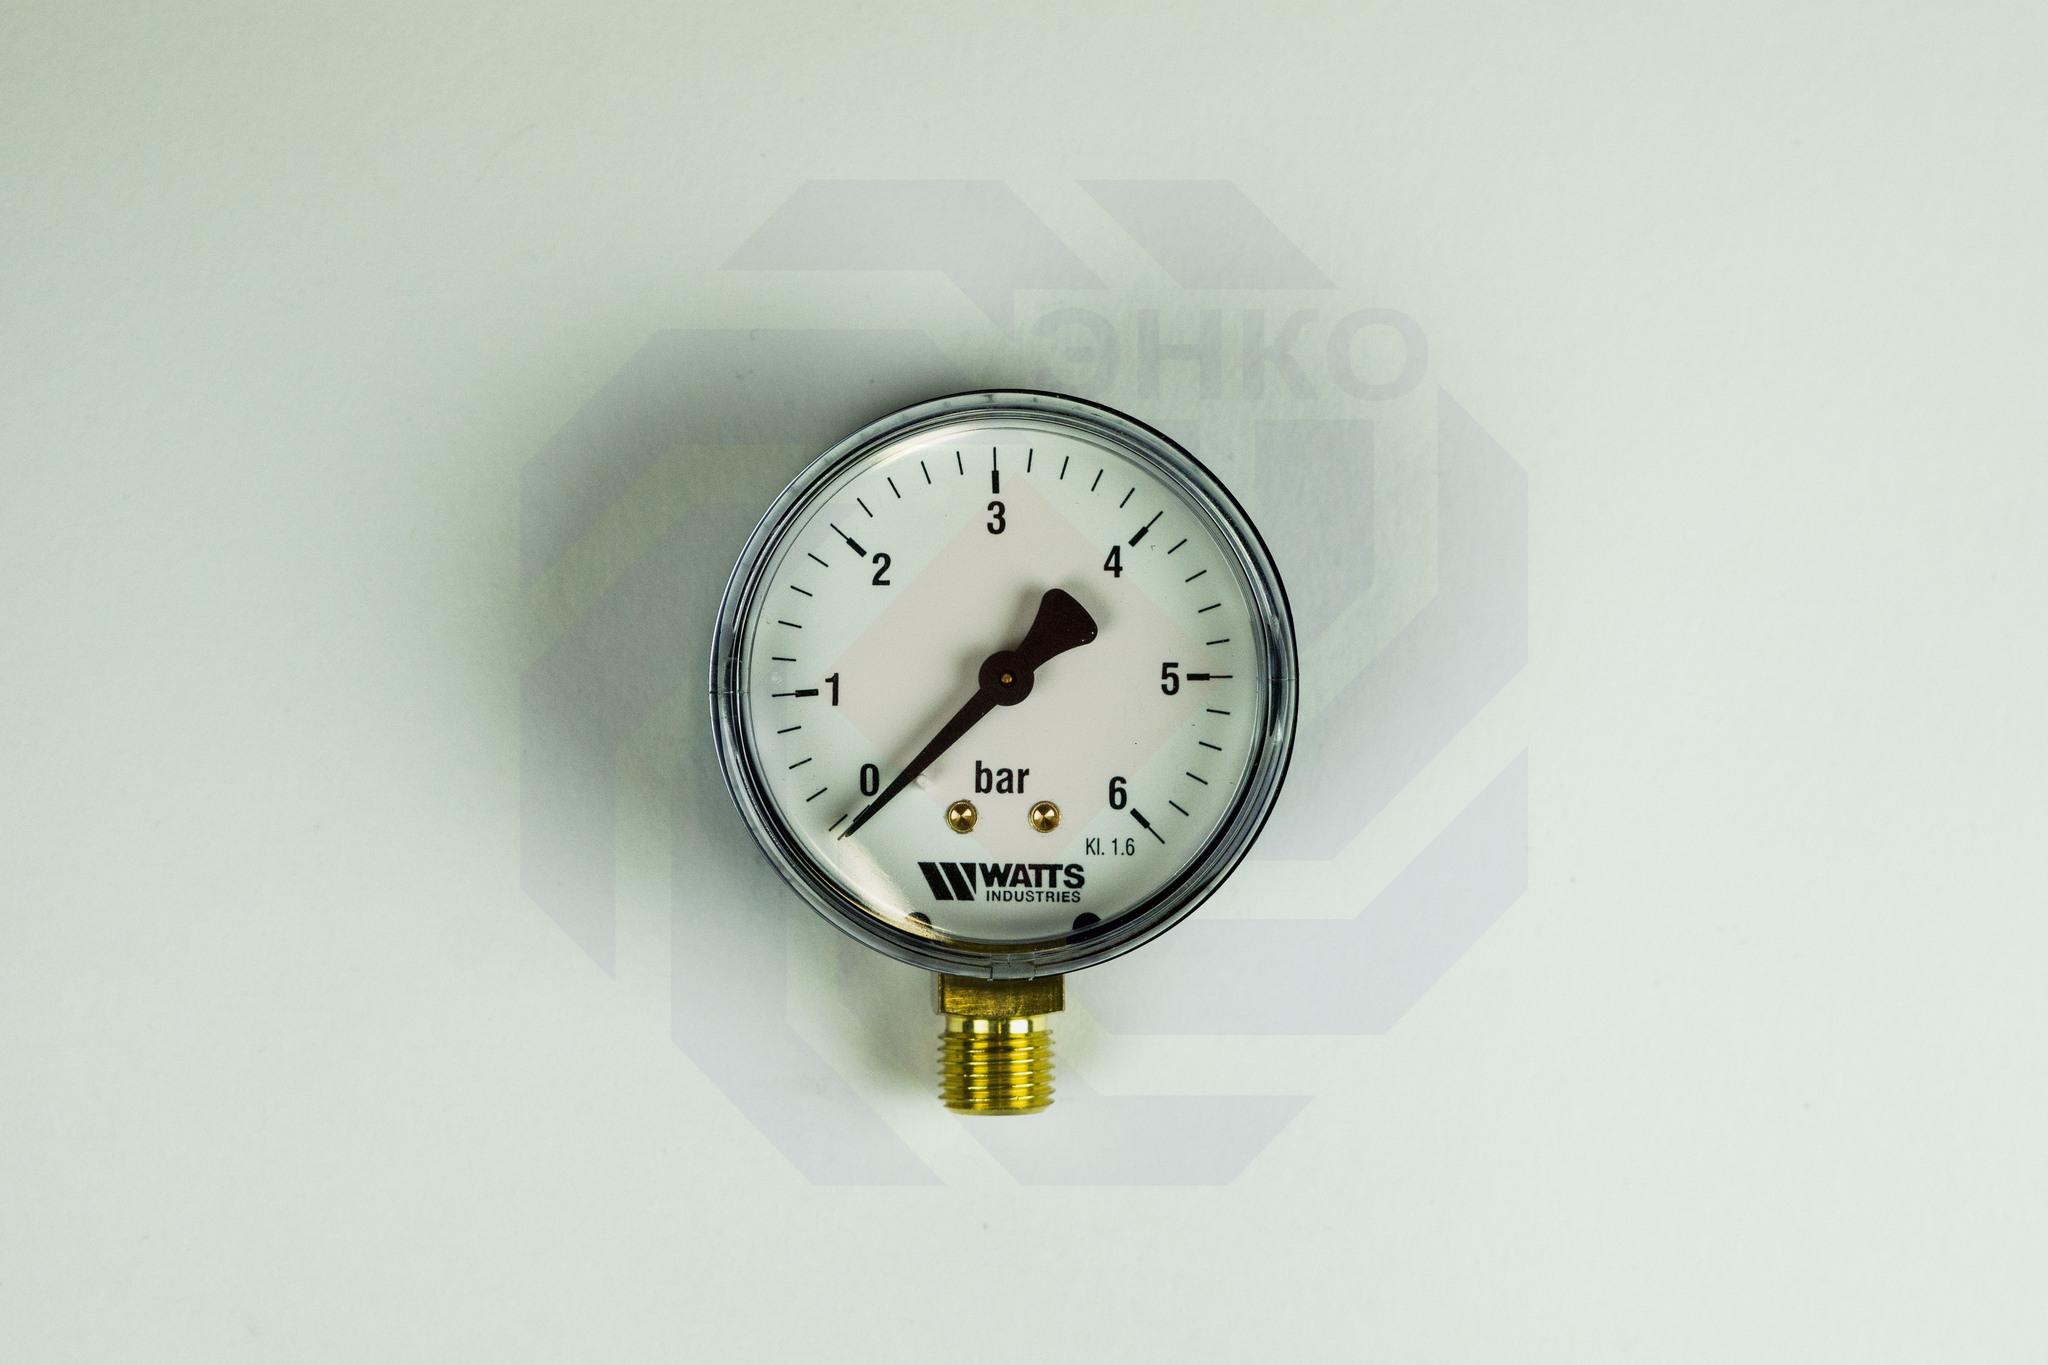 Манометр радиальный WATTS MDR 63/6 (F+R200) 0-6 бар 63 мм ¼